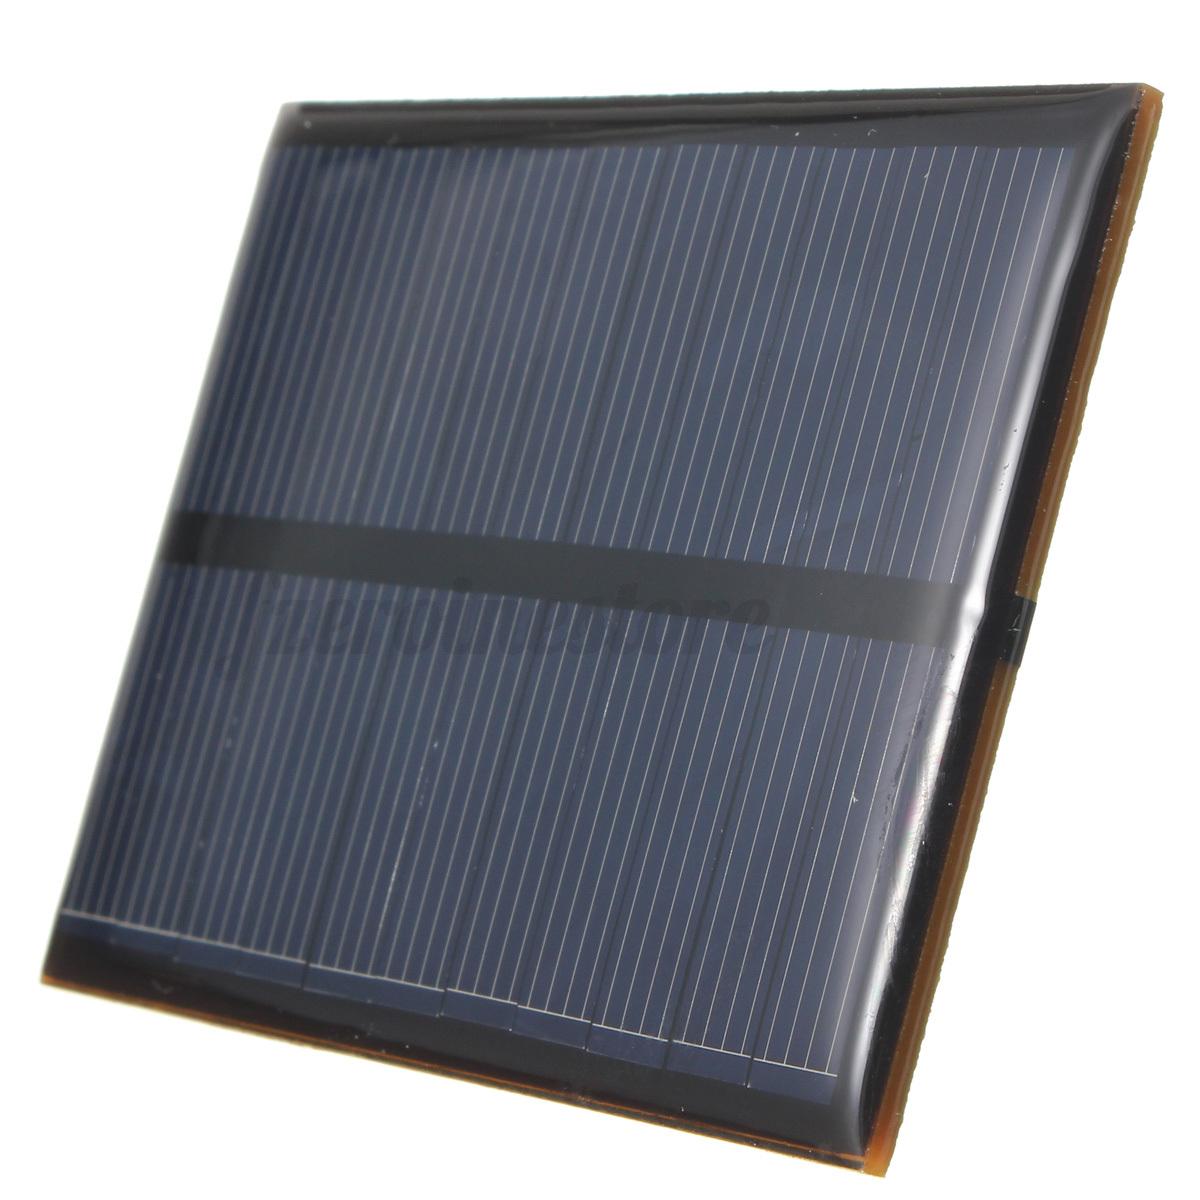 Hk 5 5v 0 66w 120ma Solar Panels Module Diy For Small